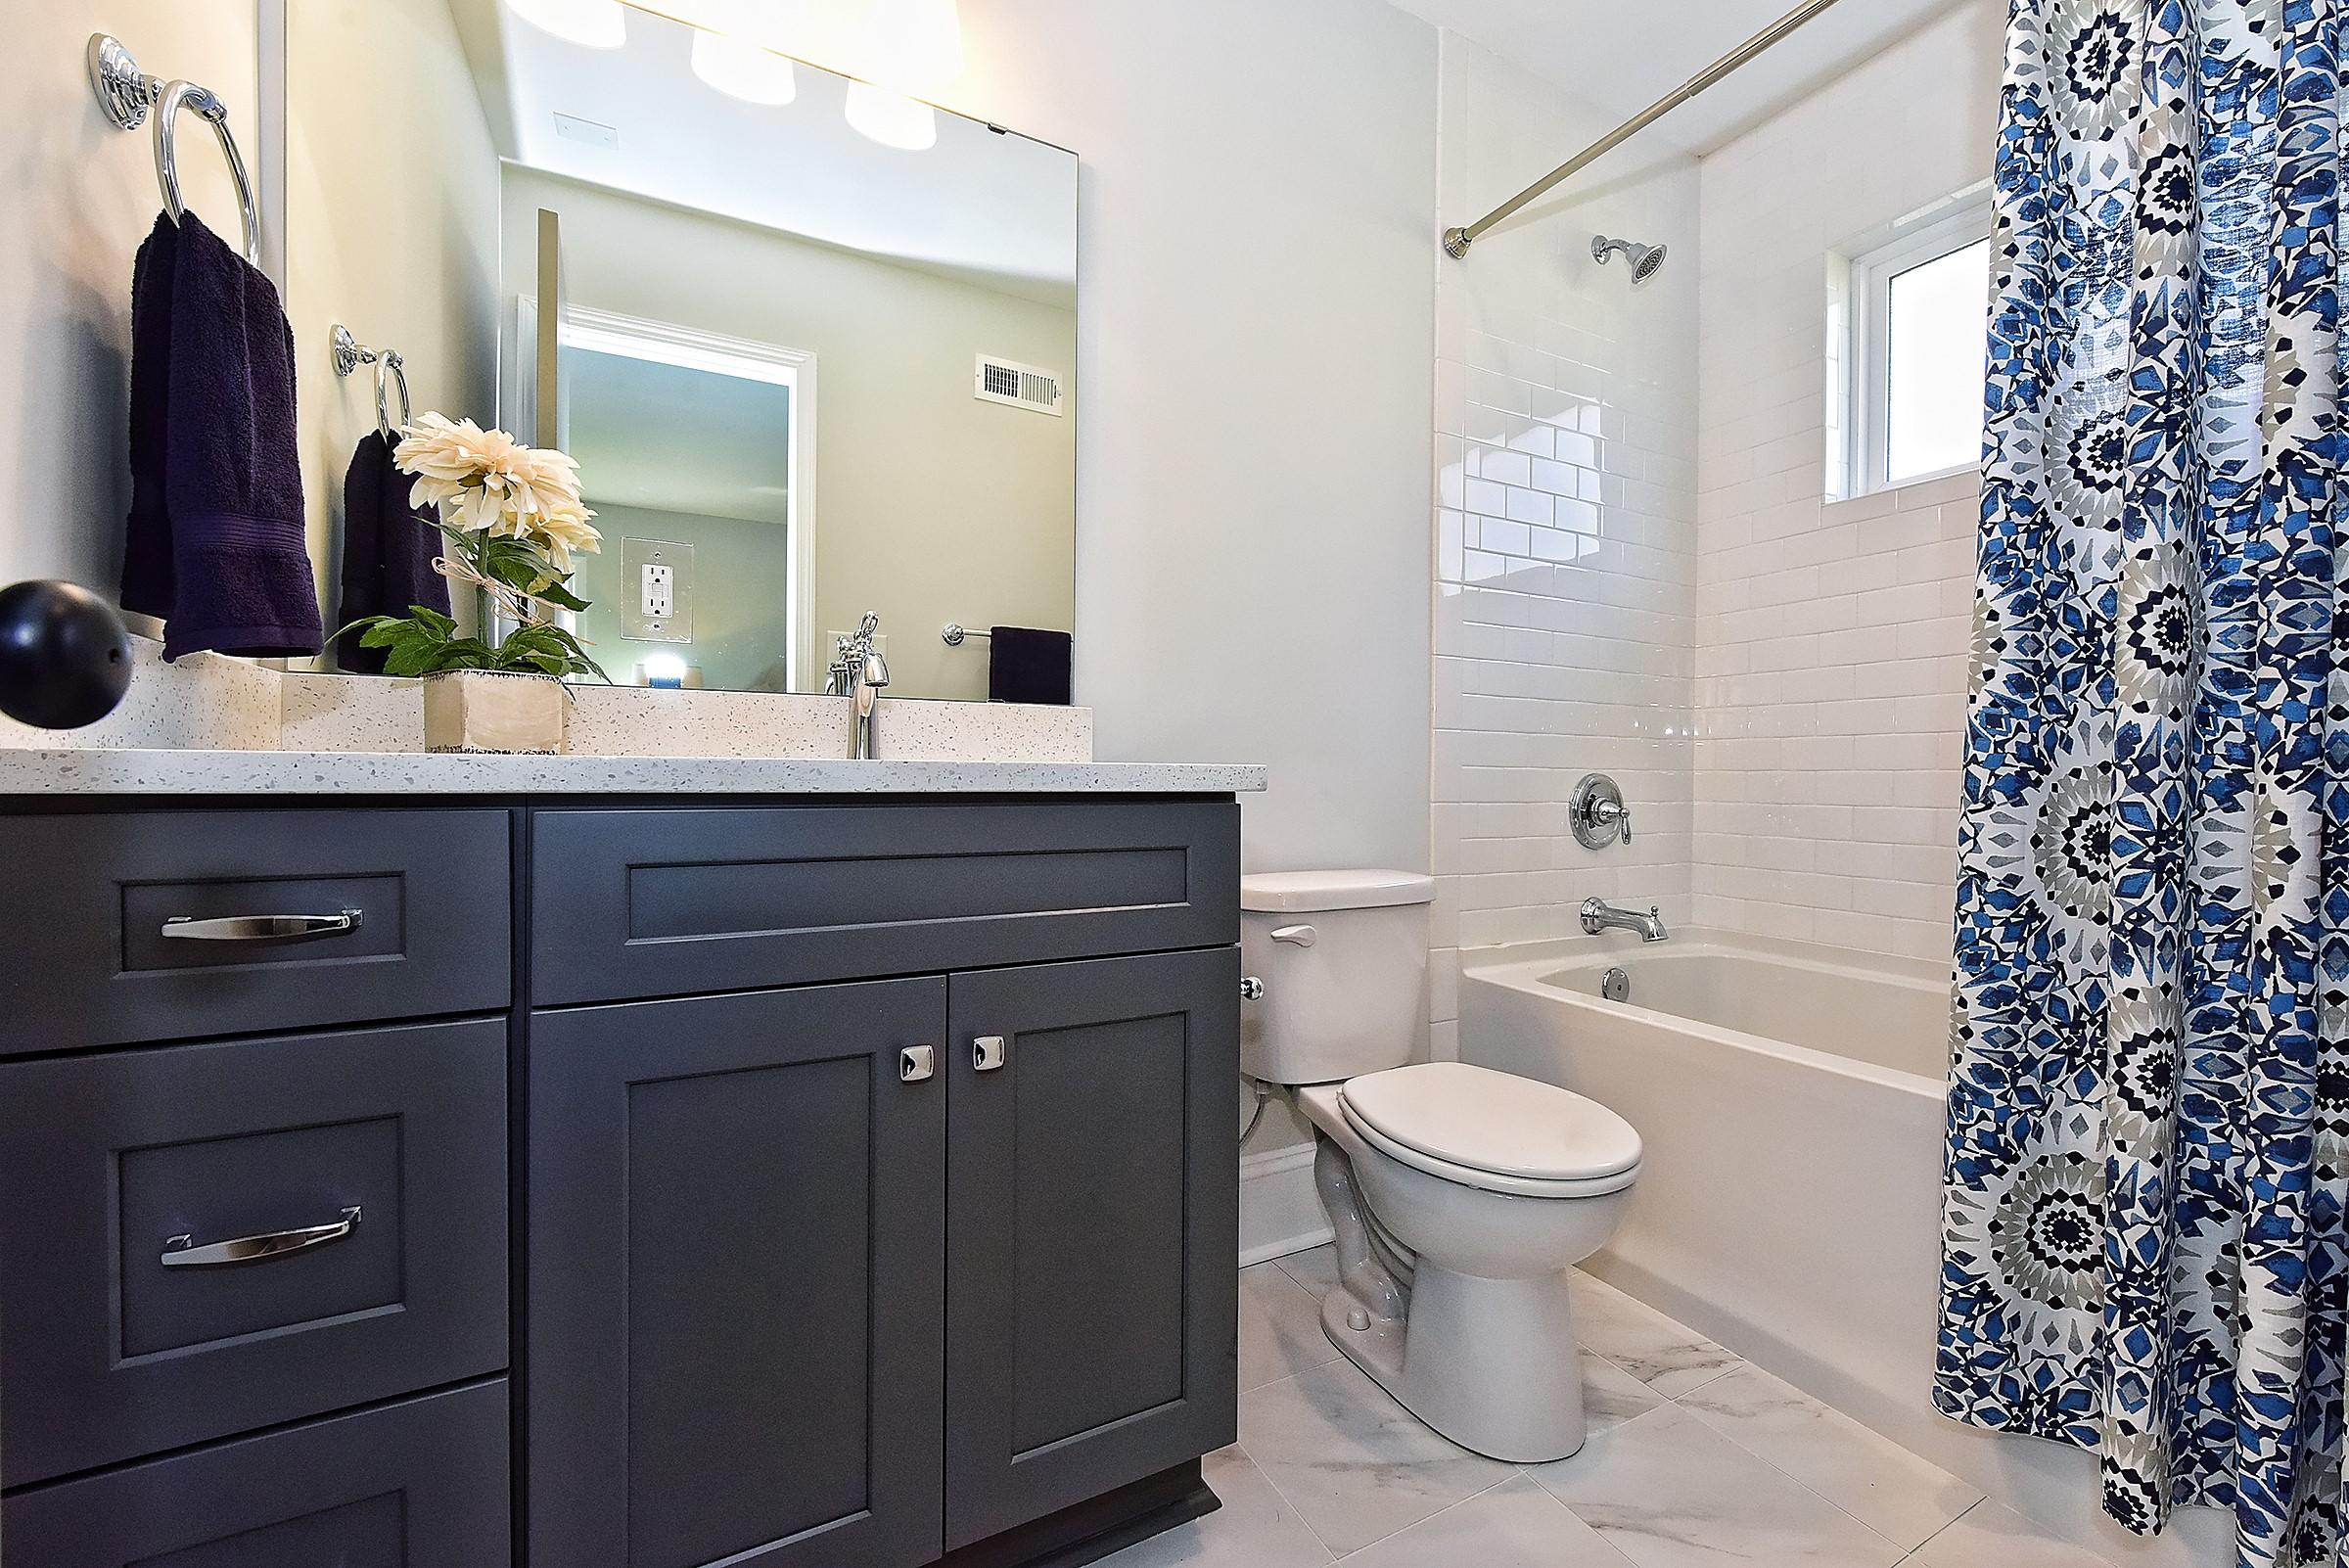 044_Bathroom.jpg